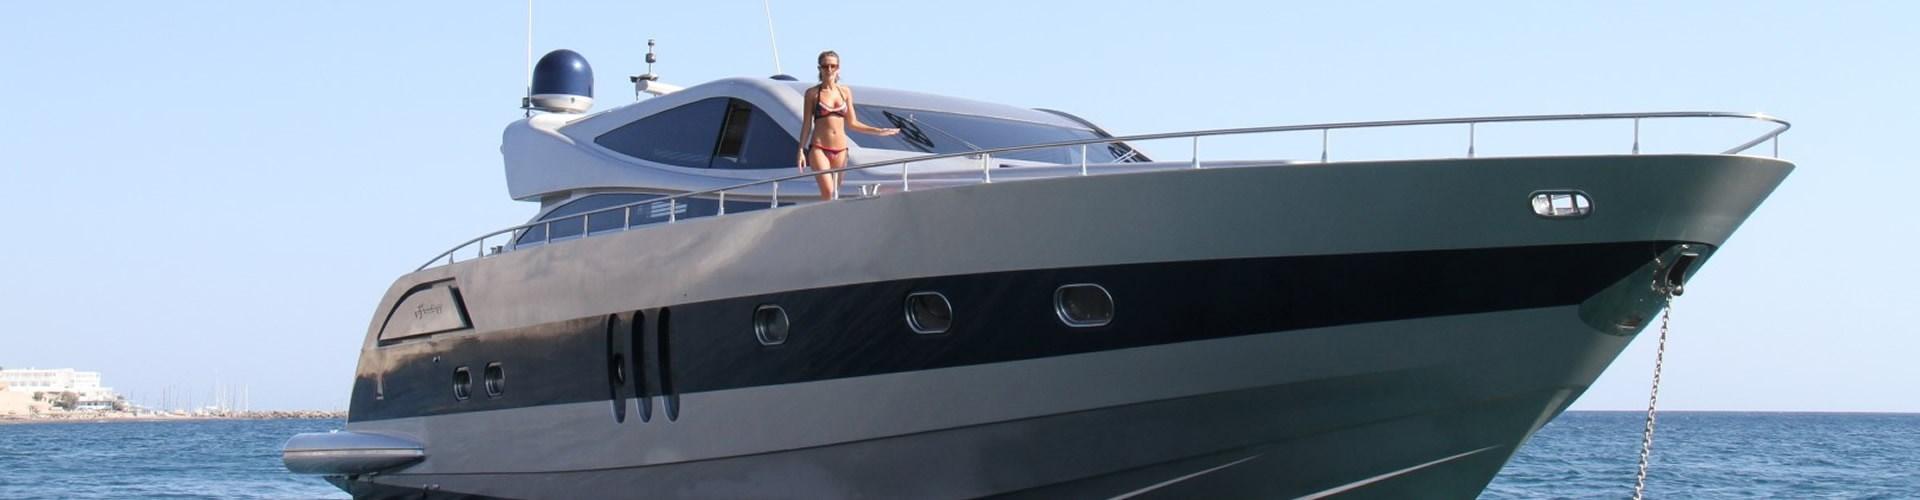 Photo of Luxury Private Yacht Cruise in Santorini